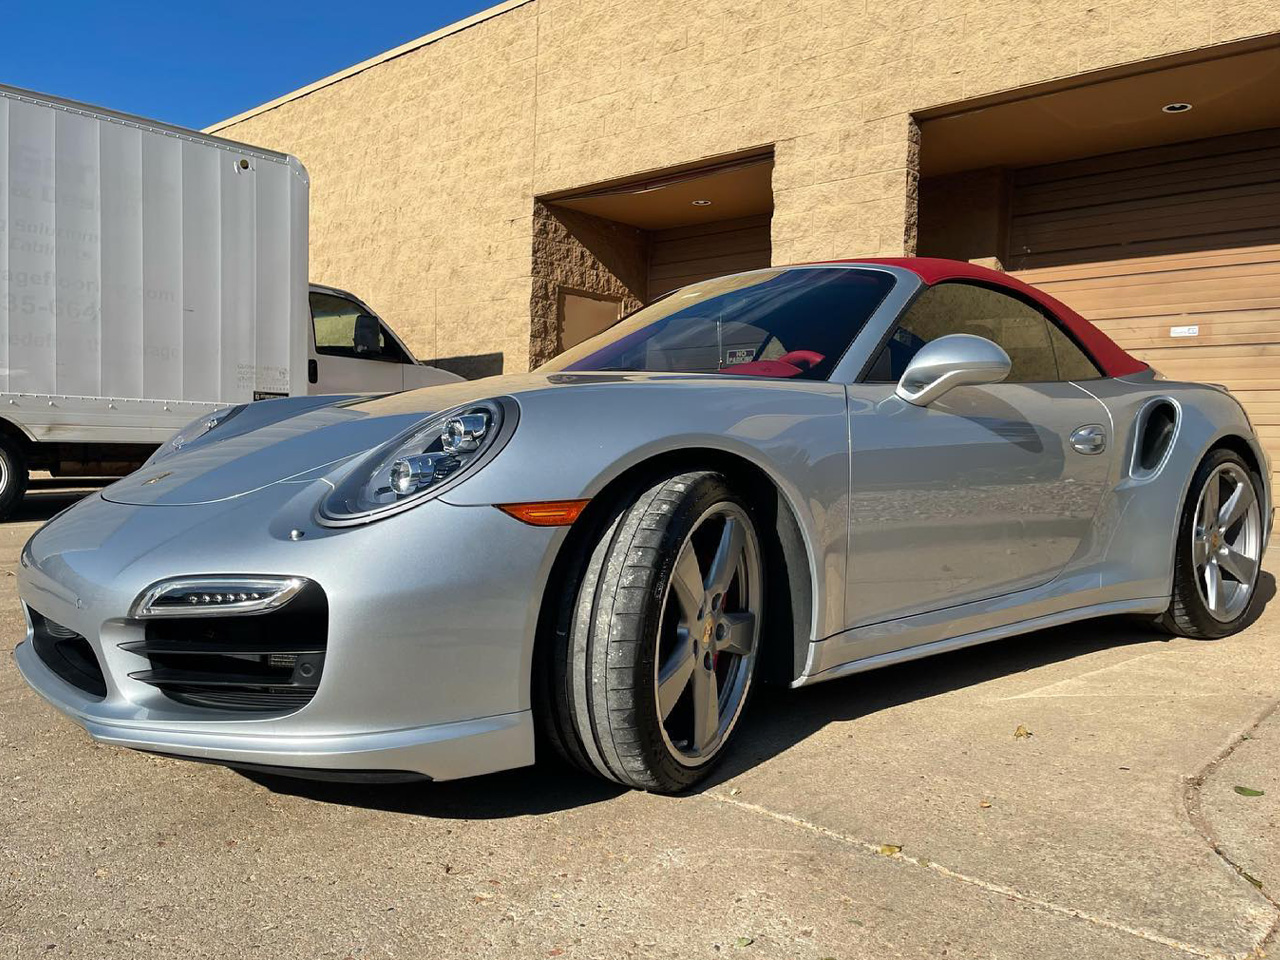 Porsche 911 Turbo tinted windows